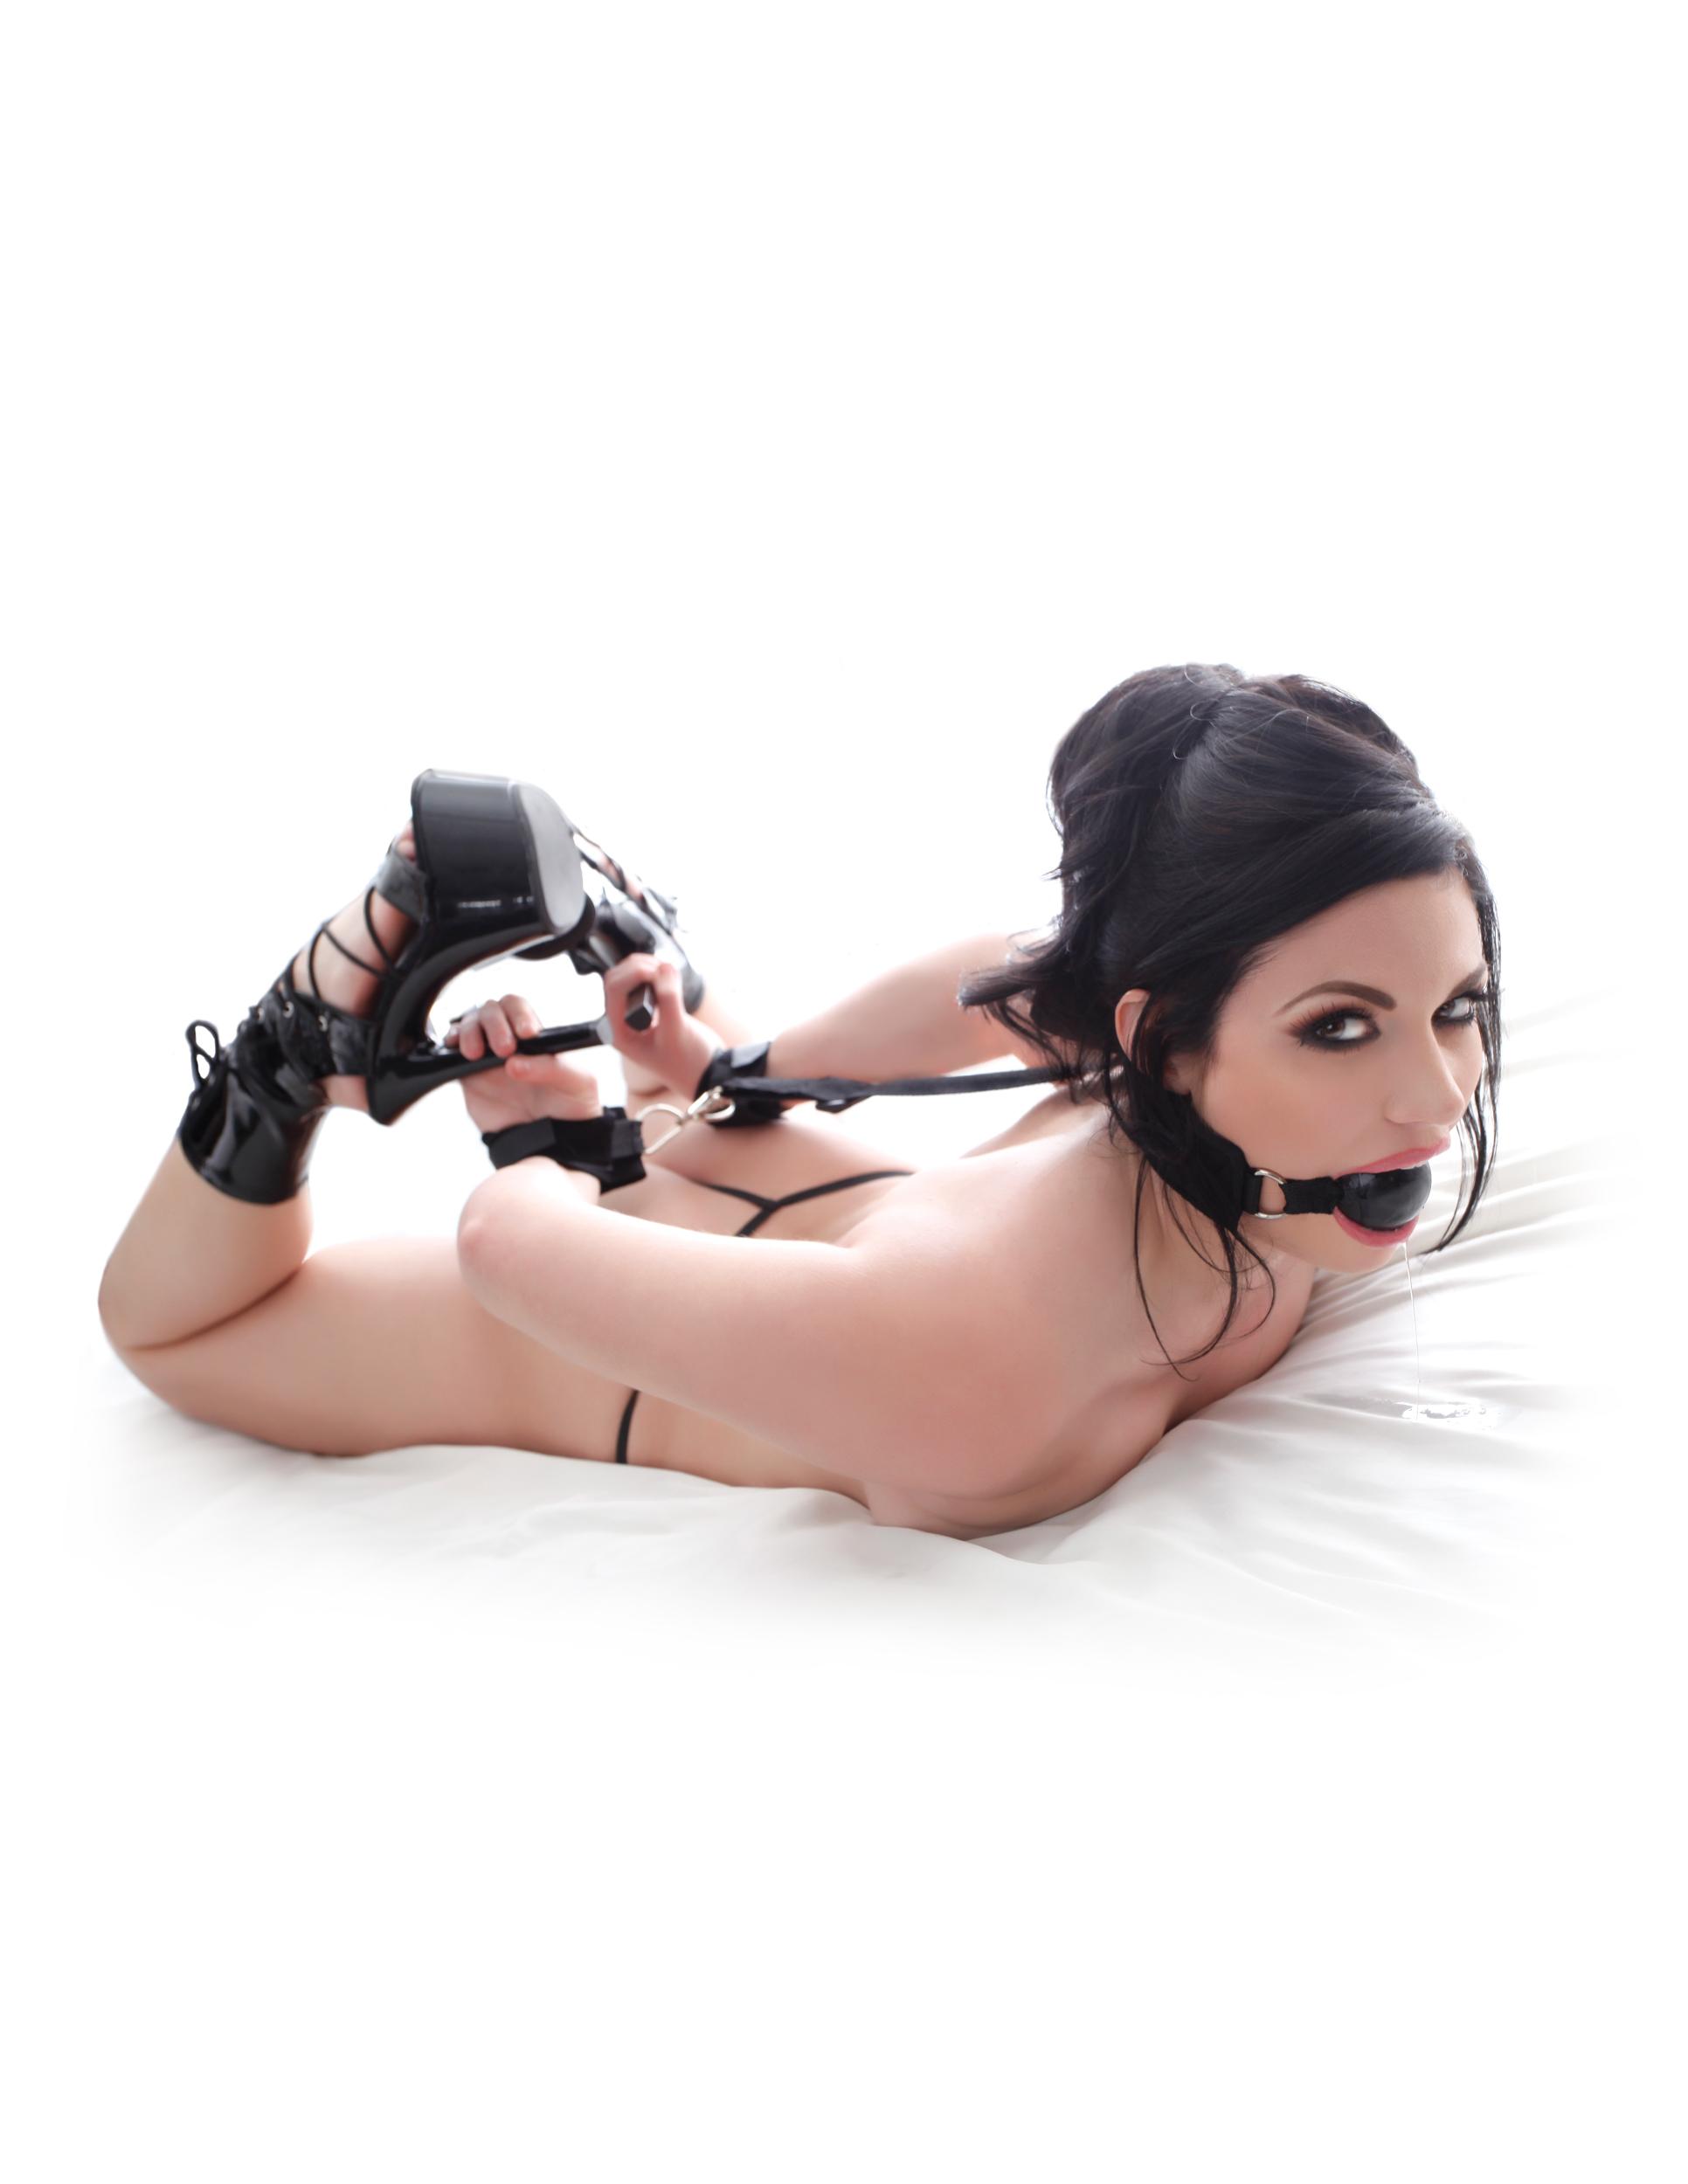 Фото секс з наручниками 22 фотография